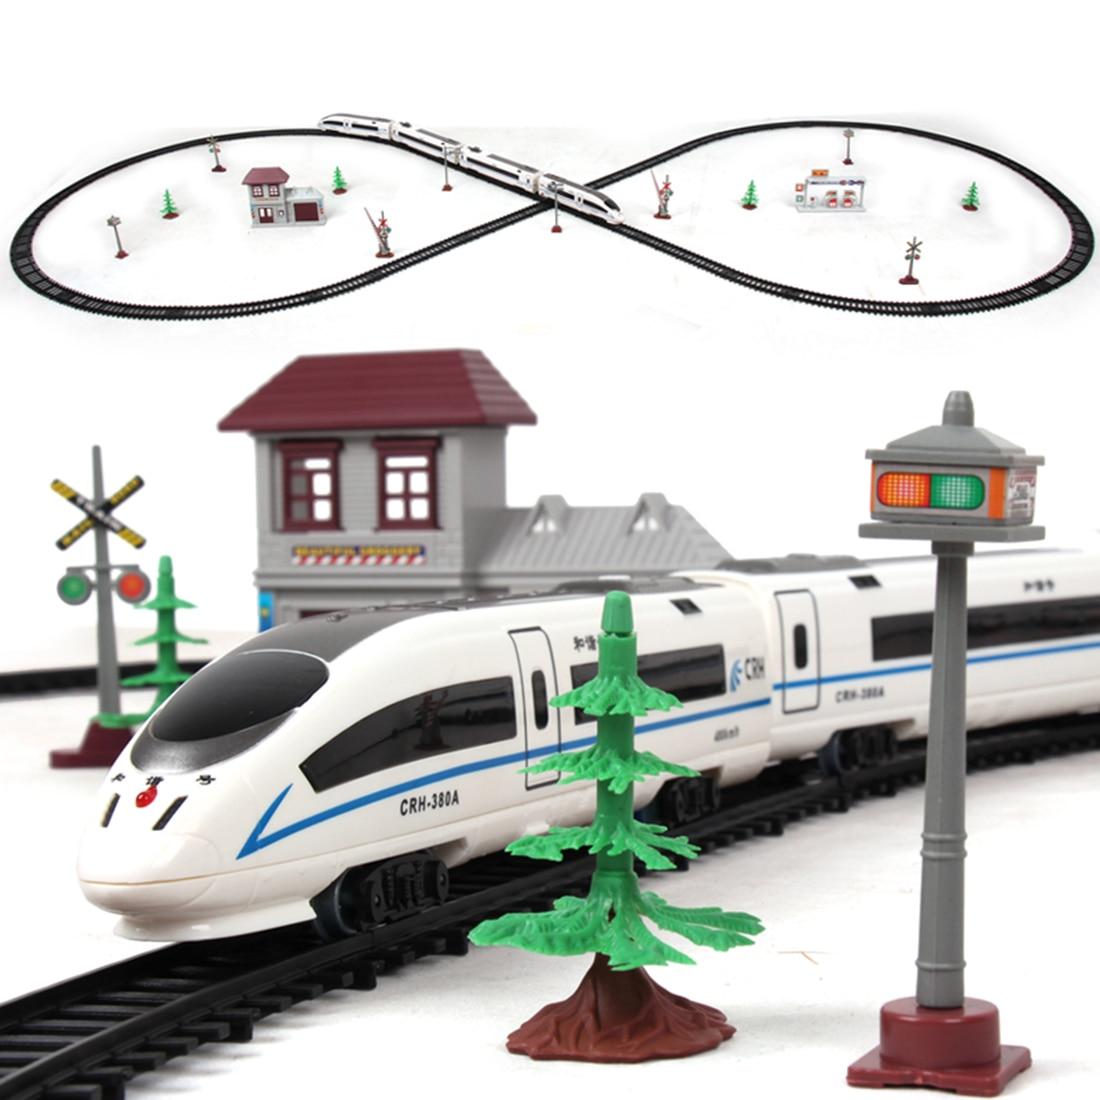 NFSTRIKE 1:87 Children Electric Simulation High-speed Rail Harmony Train Toy Set Sand Table Scene Train Track - L